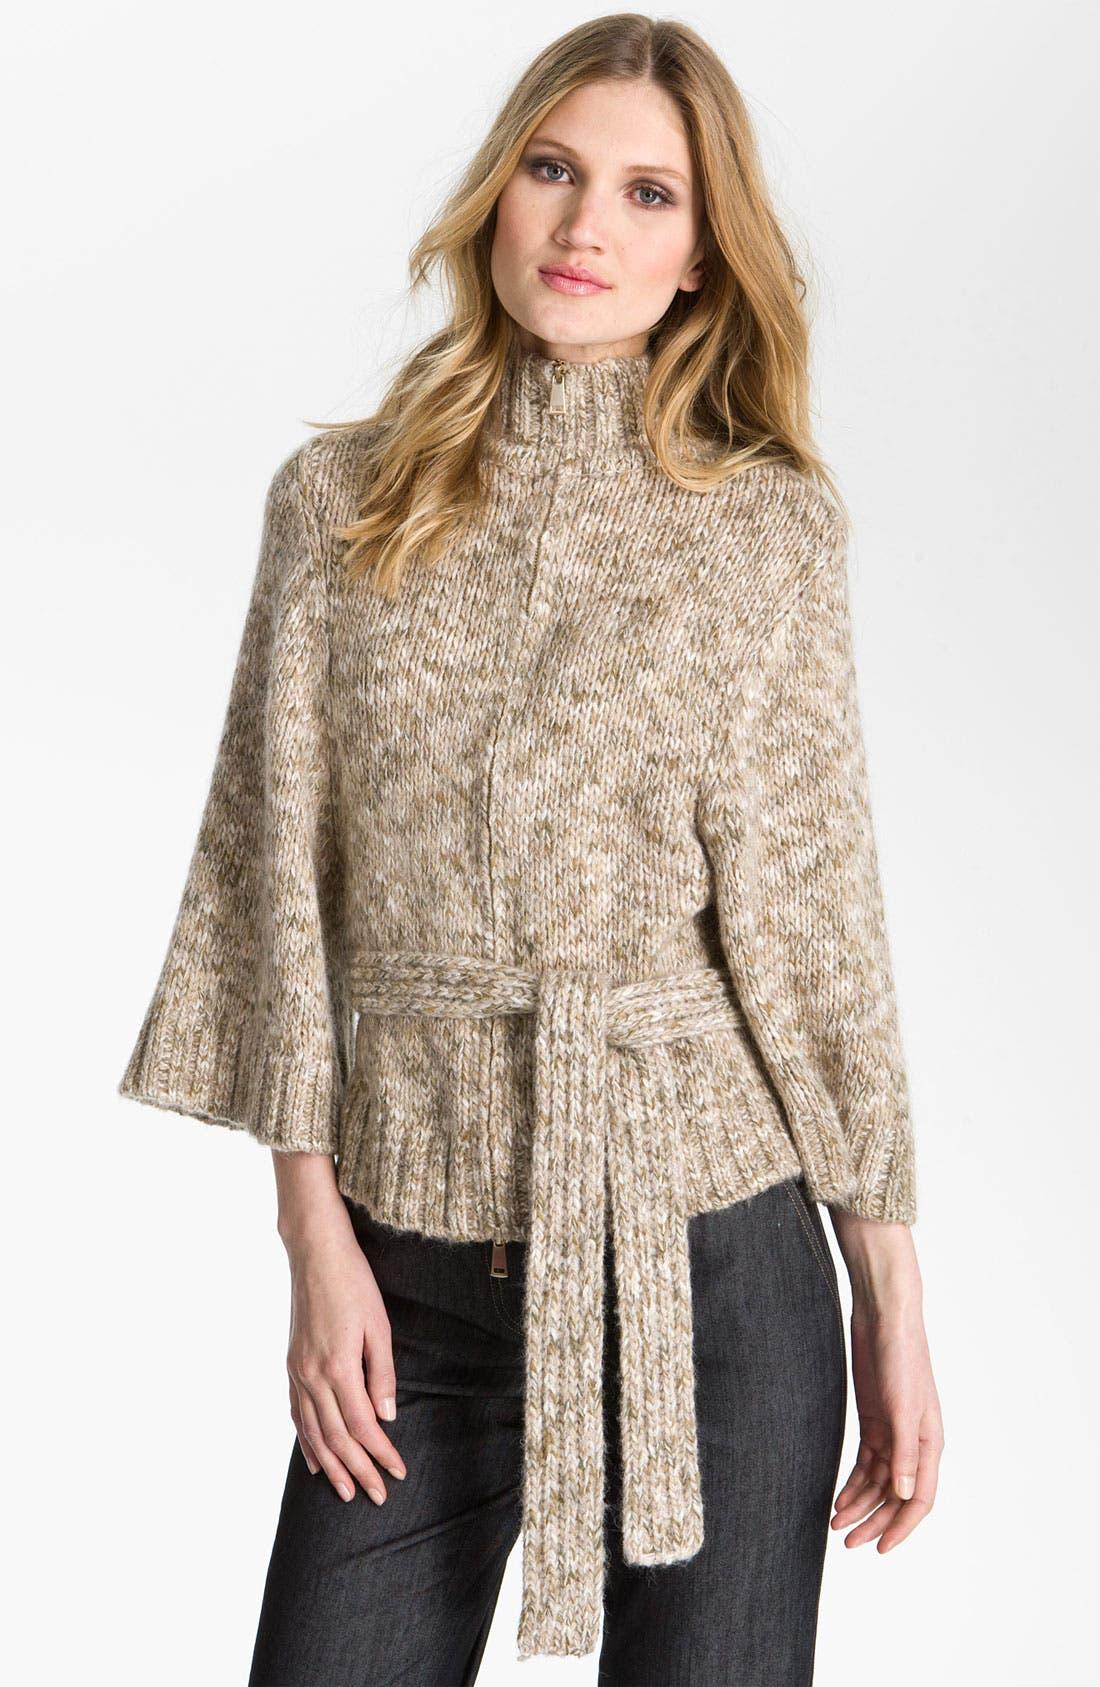 Alternate Image 1 Selected - St. John Yellow Label Belted Tweed Knit Cardigan